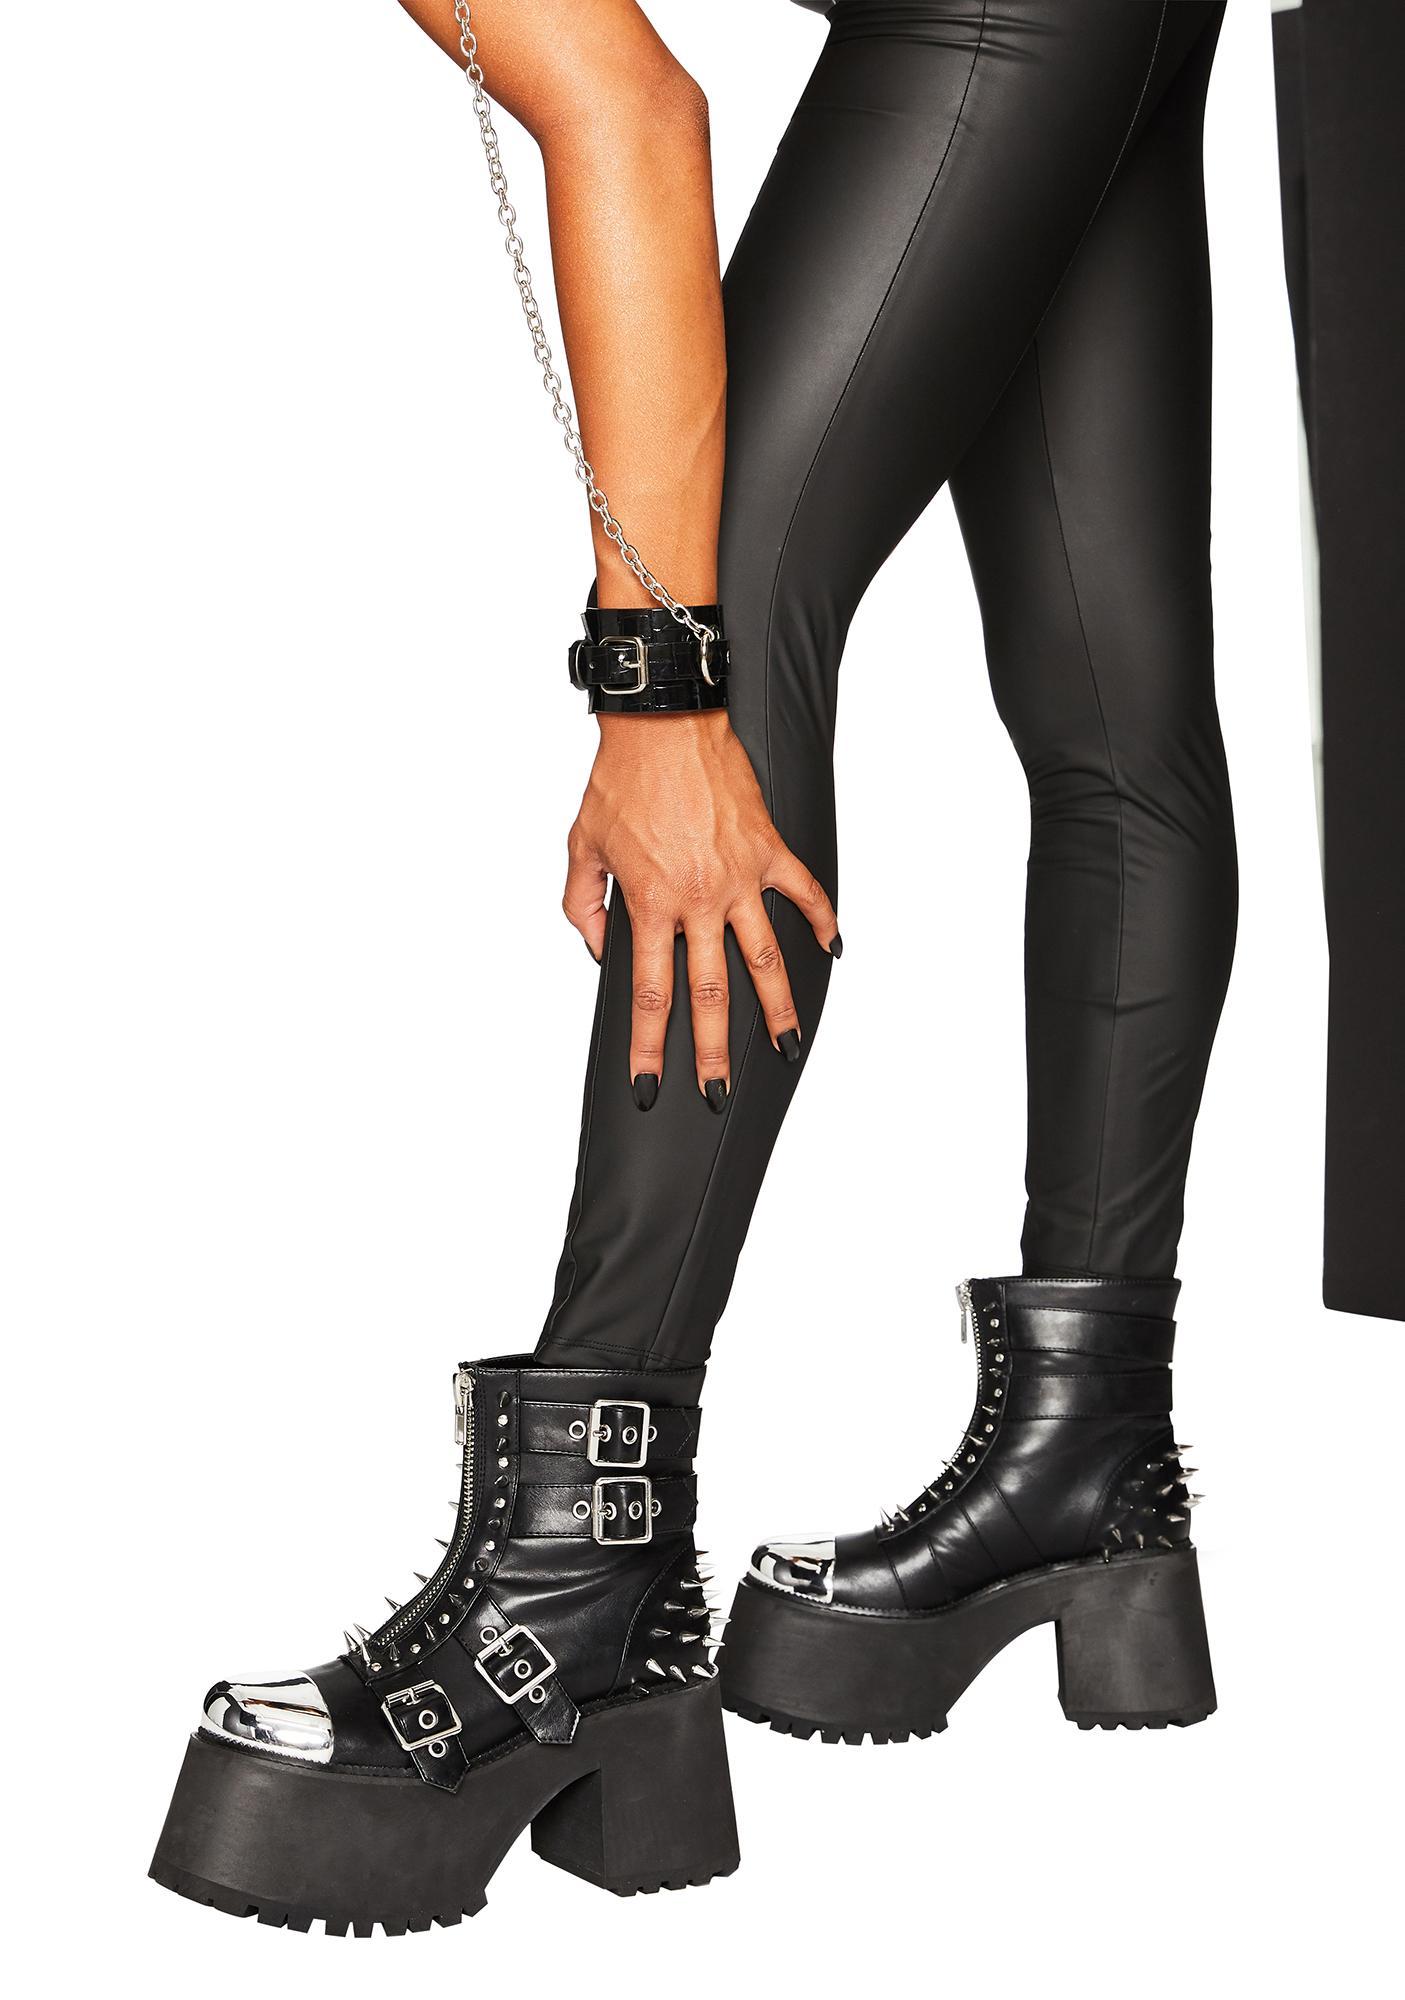 Club Exx Lone Raver Platform Boots